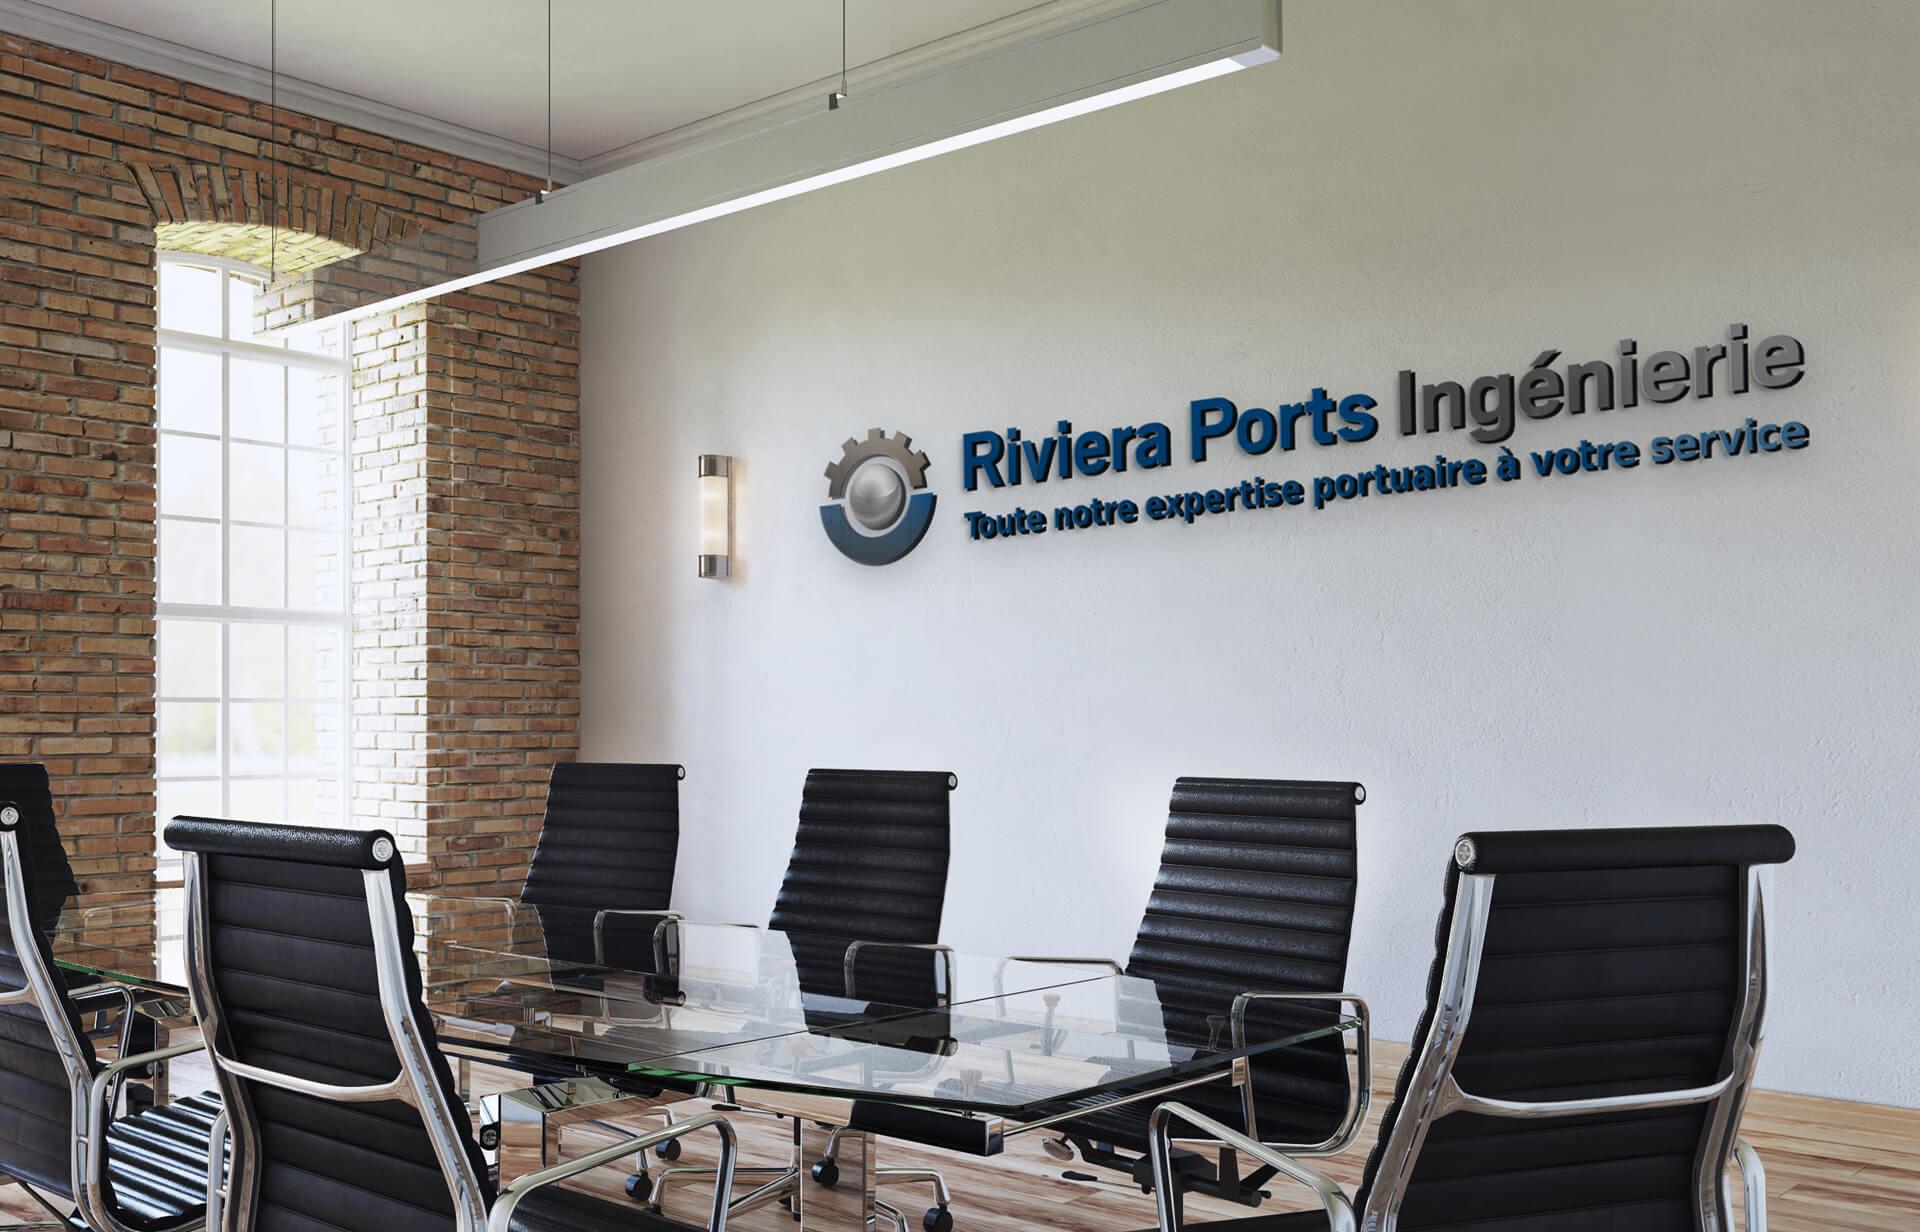 Riviera Ports Ingenierie